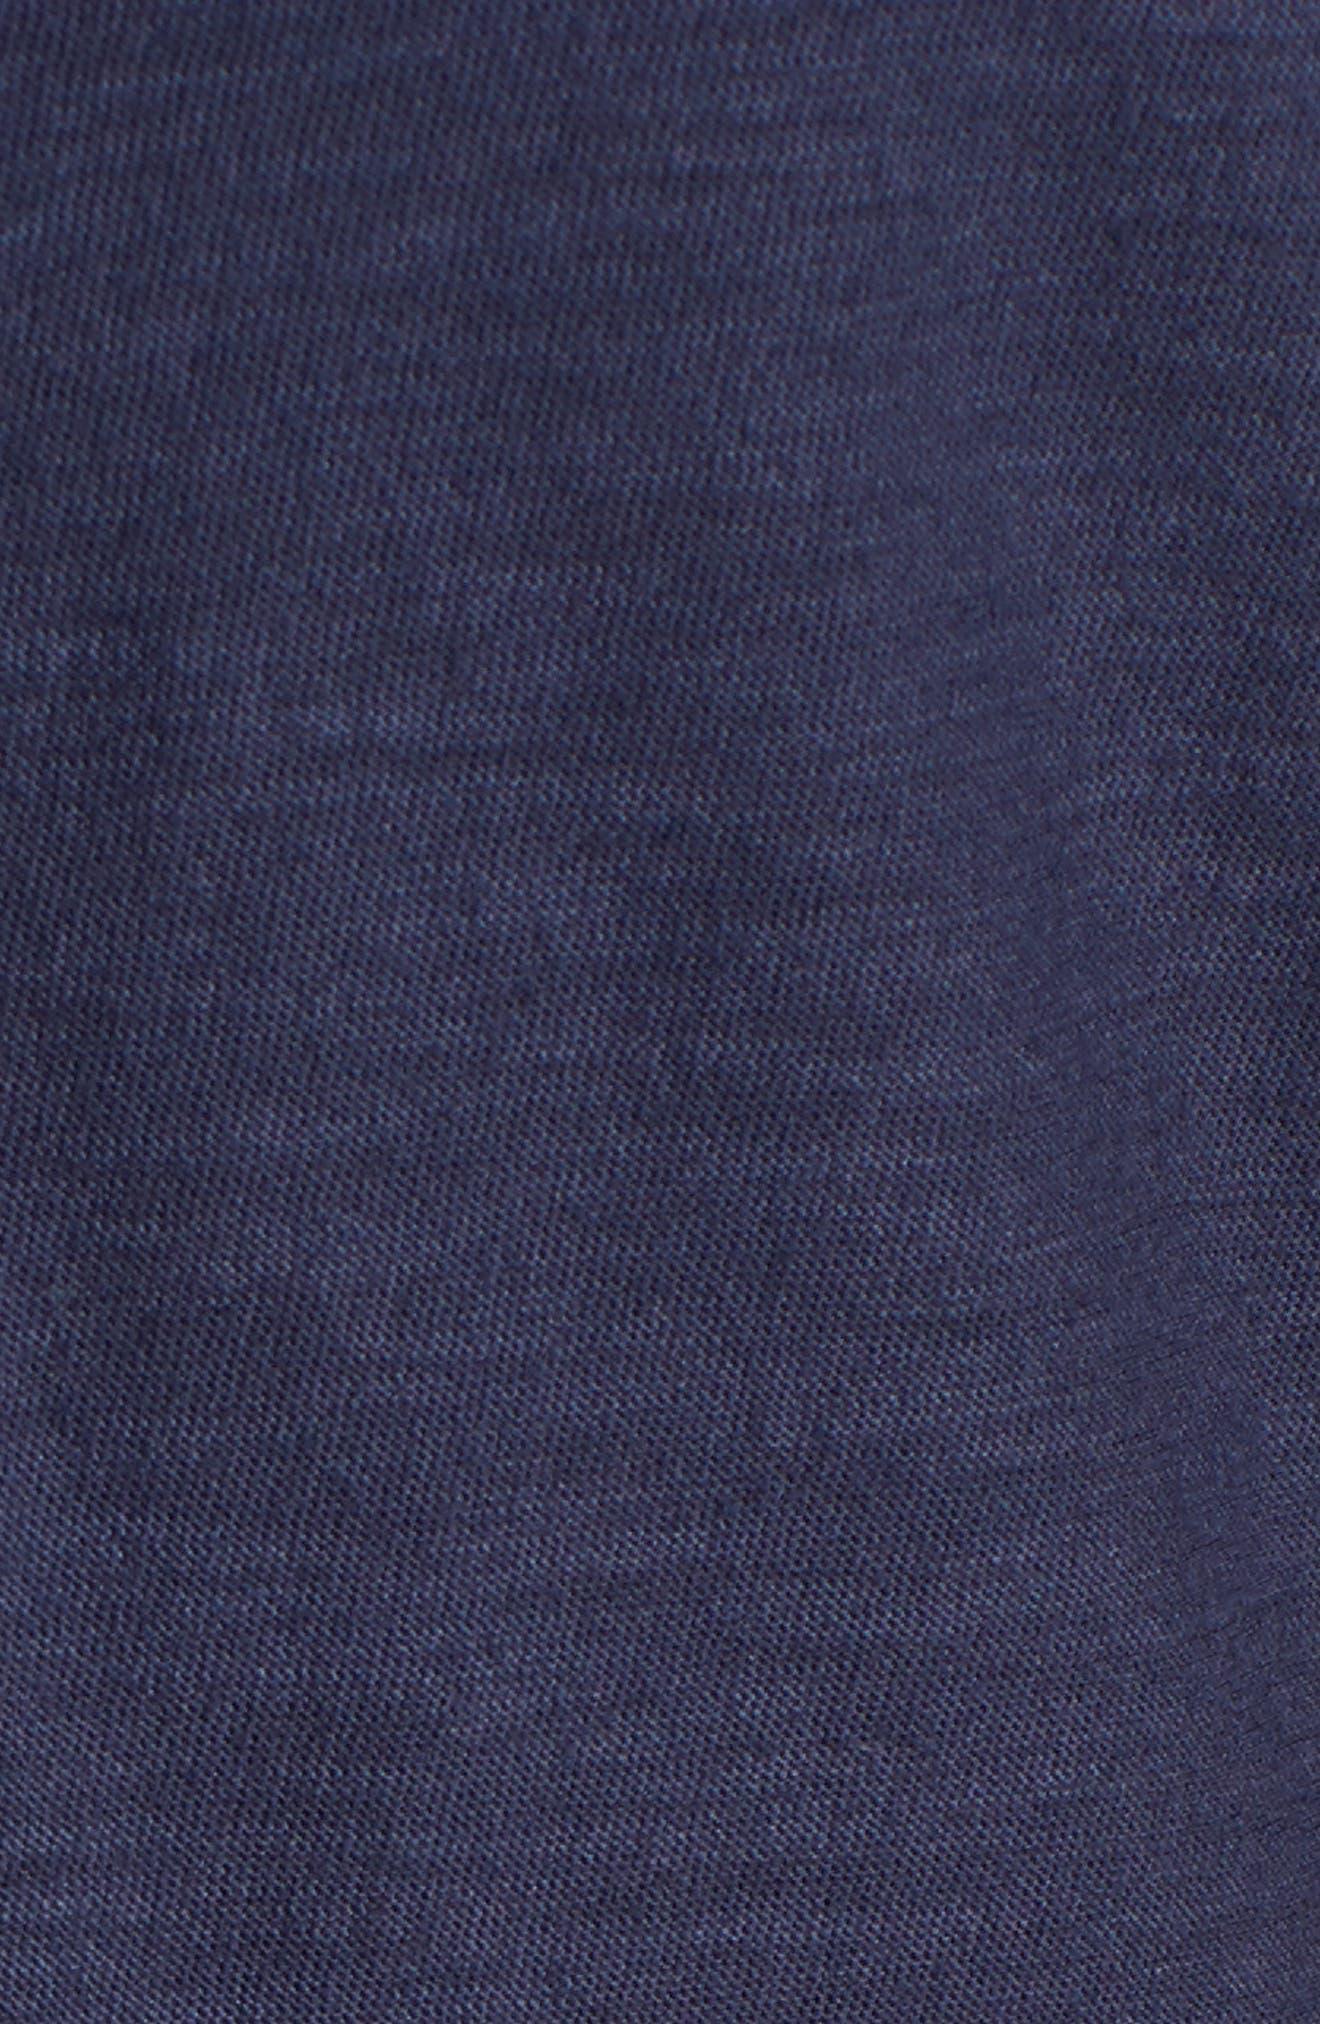 Arden Pleat Jersey Sundress,                             Alternate thumbnail 5, color,                             400